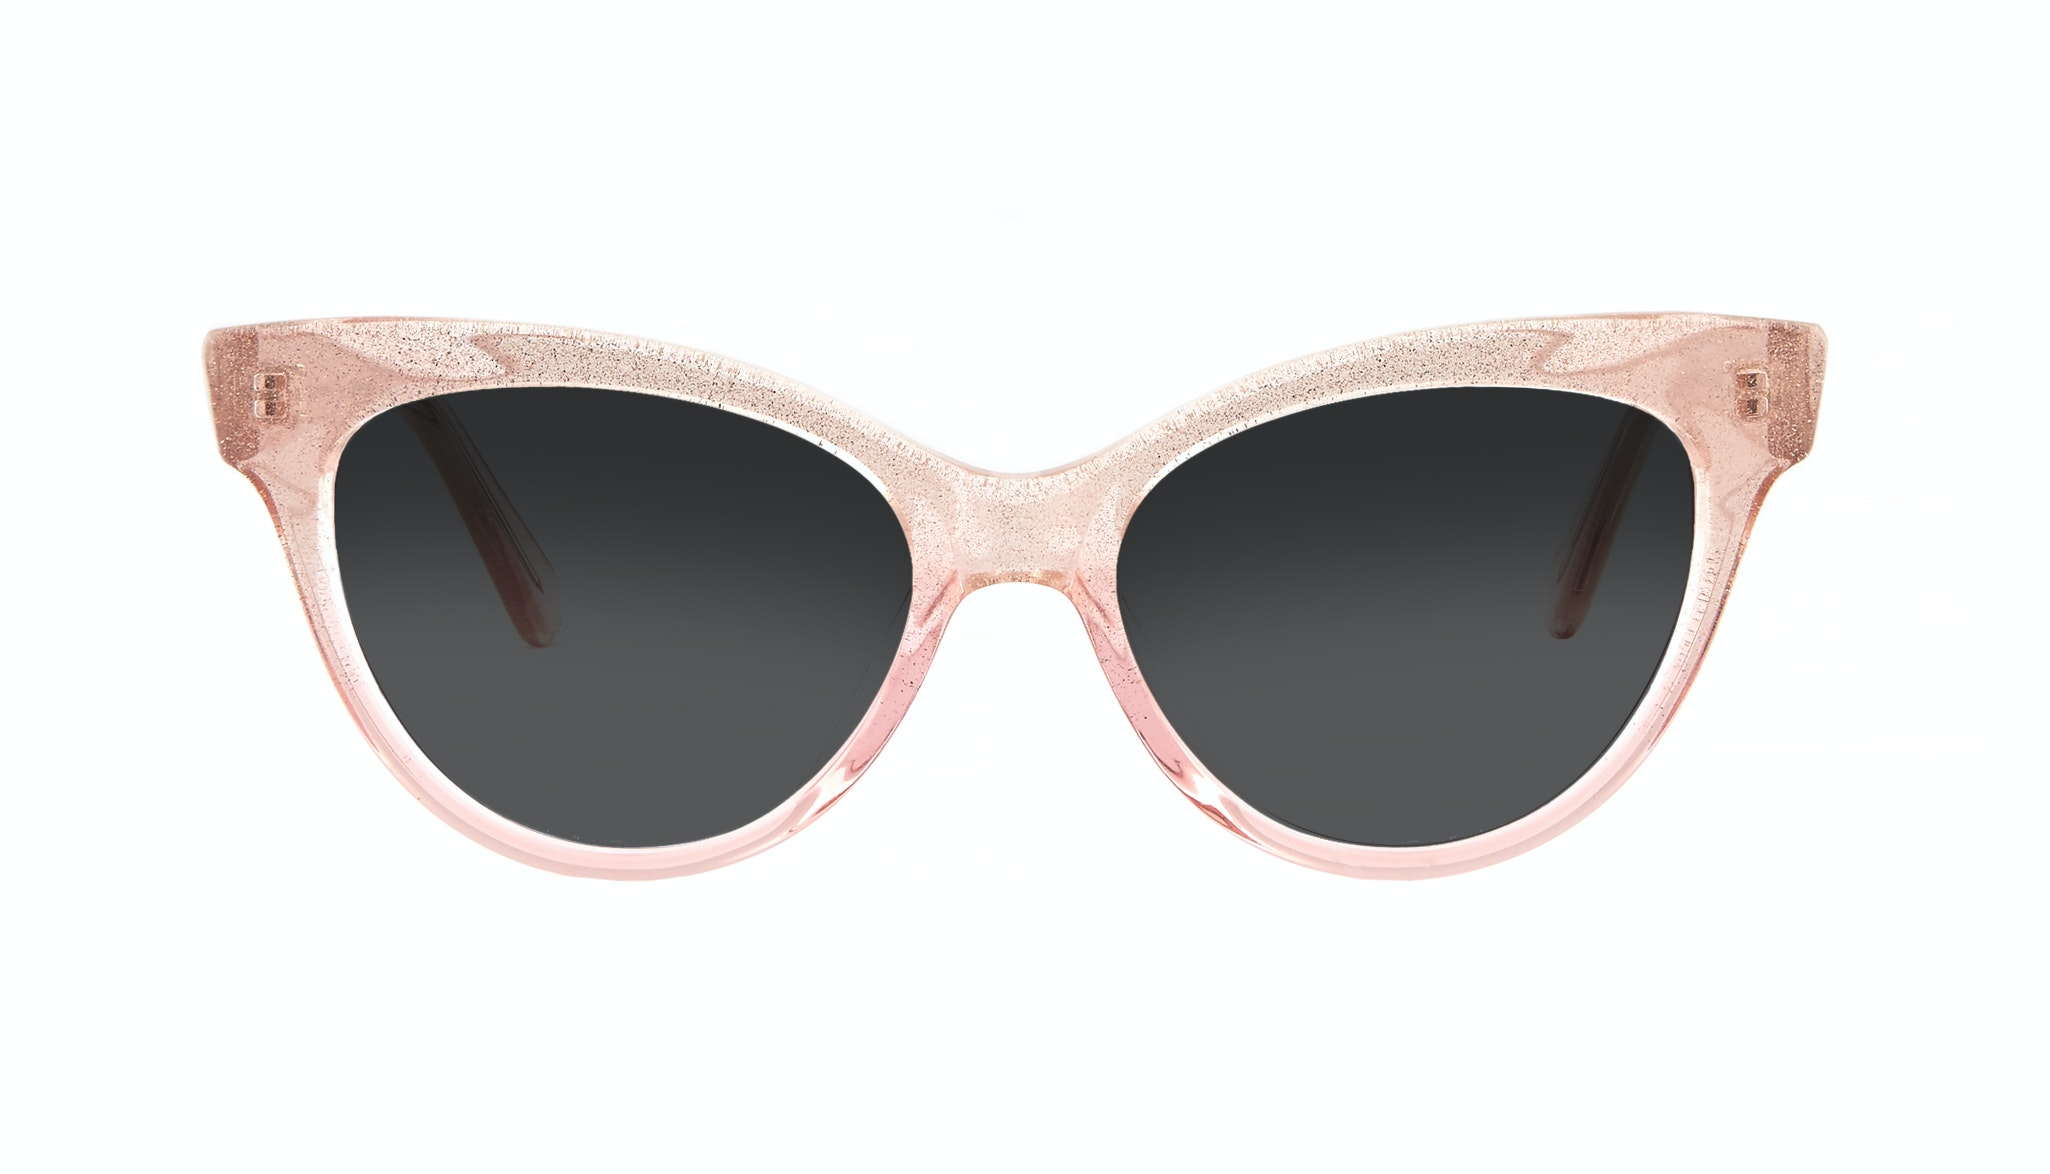 Affordable Fashion Glasses Cat Eye Daring Cateye Sunglasses Women SkunkBoy Poesy Pink Front